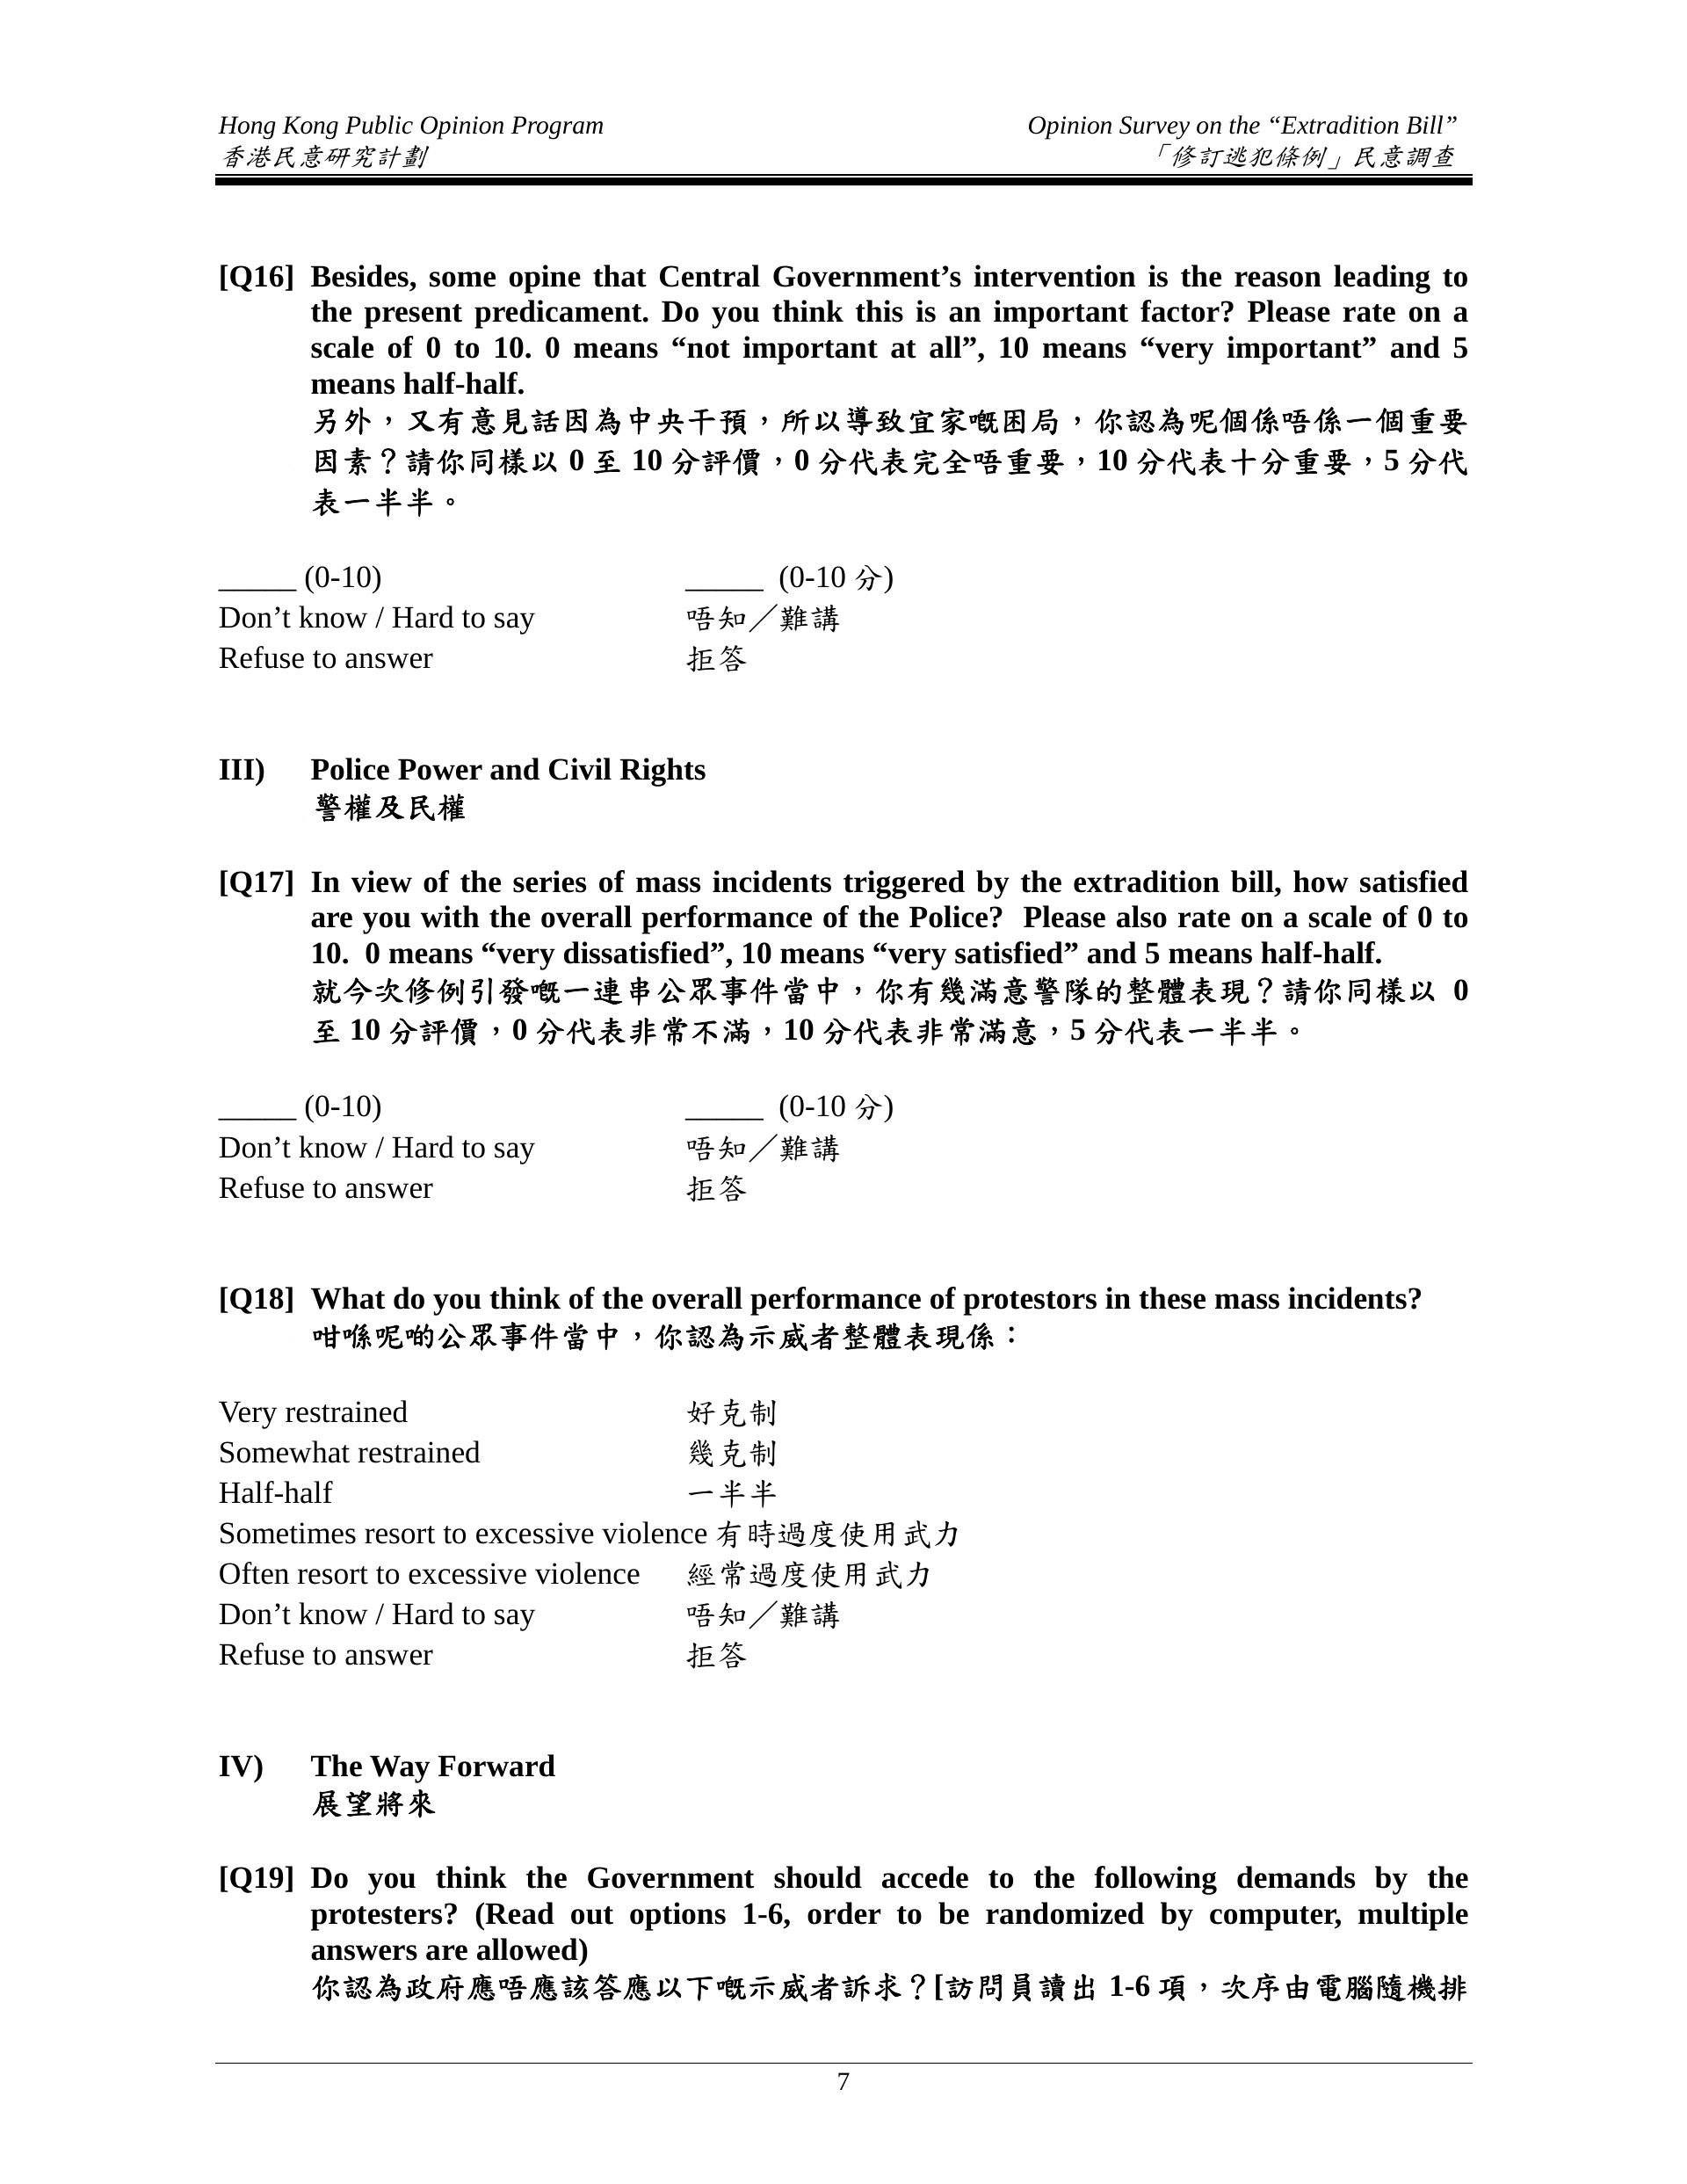 PDFtoJPG.me-07.jpg